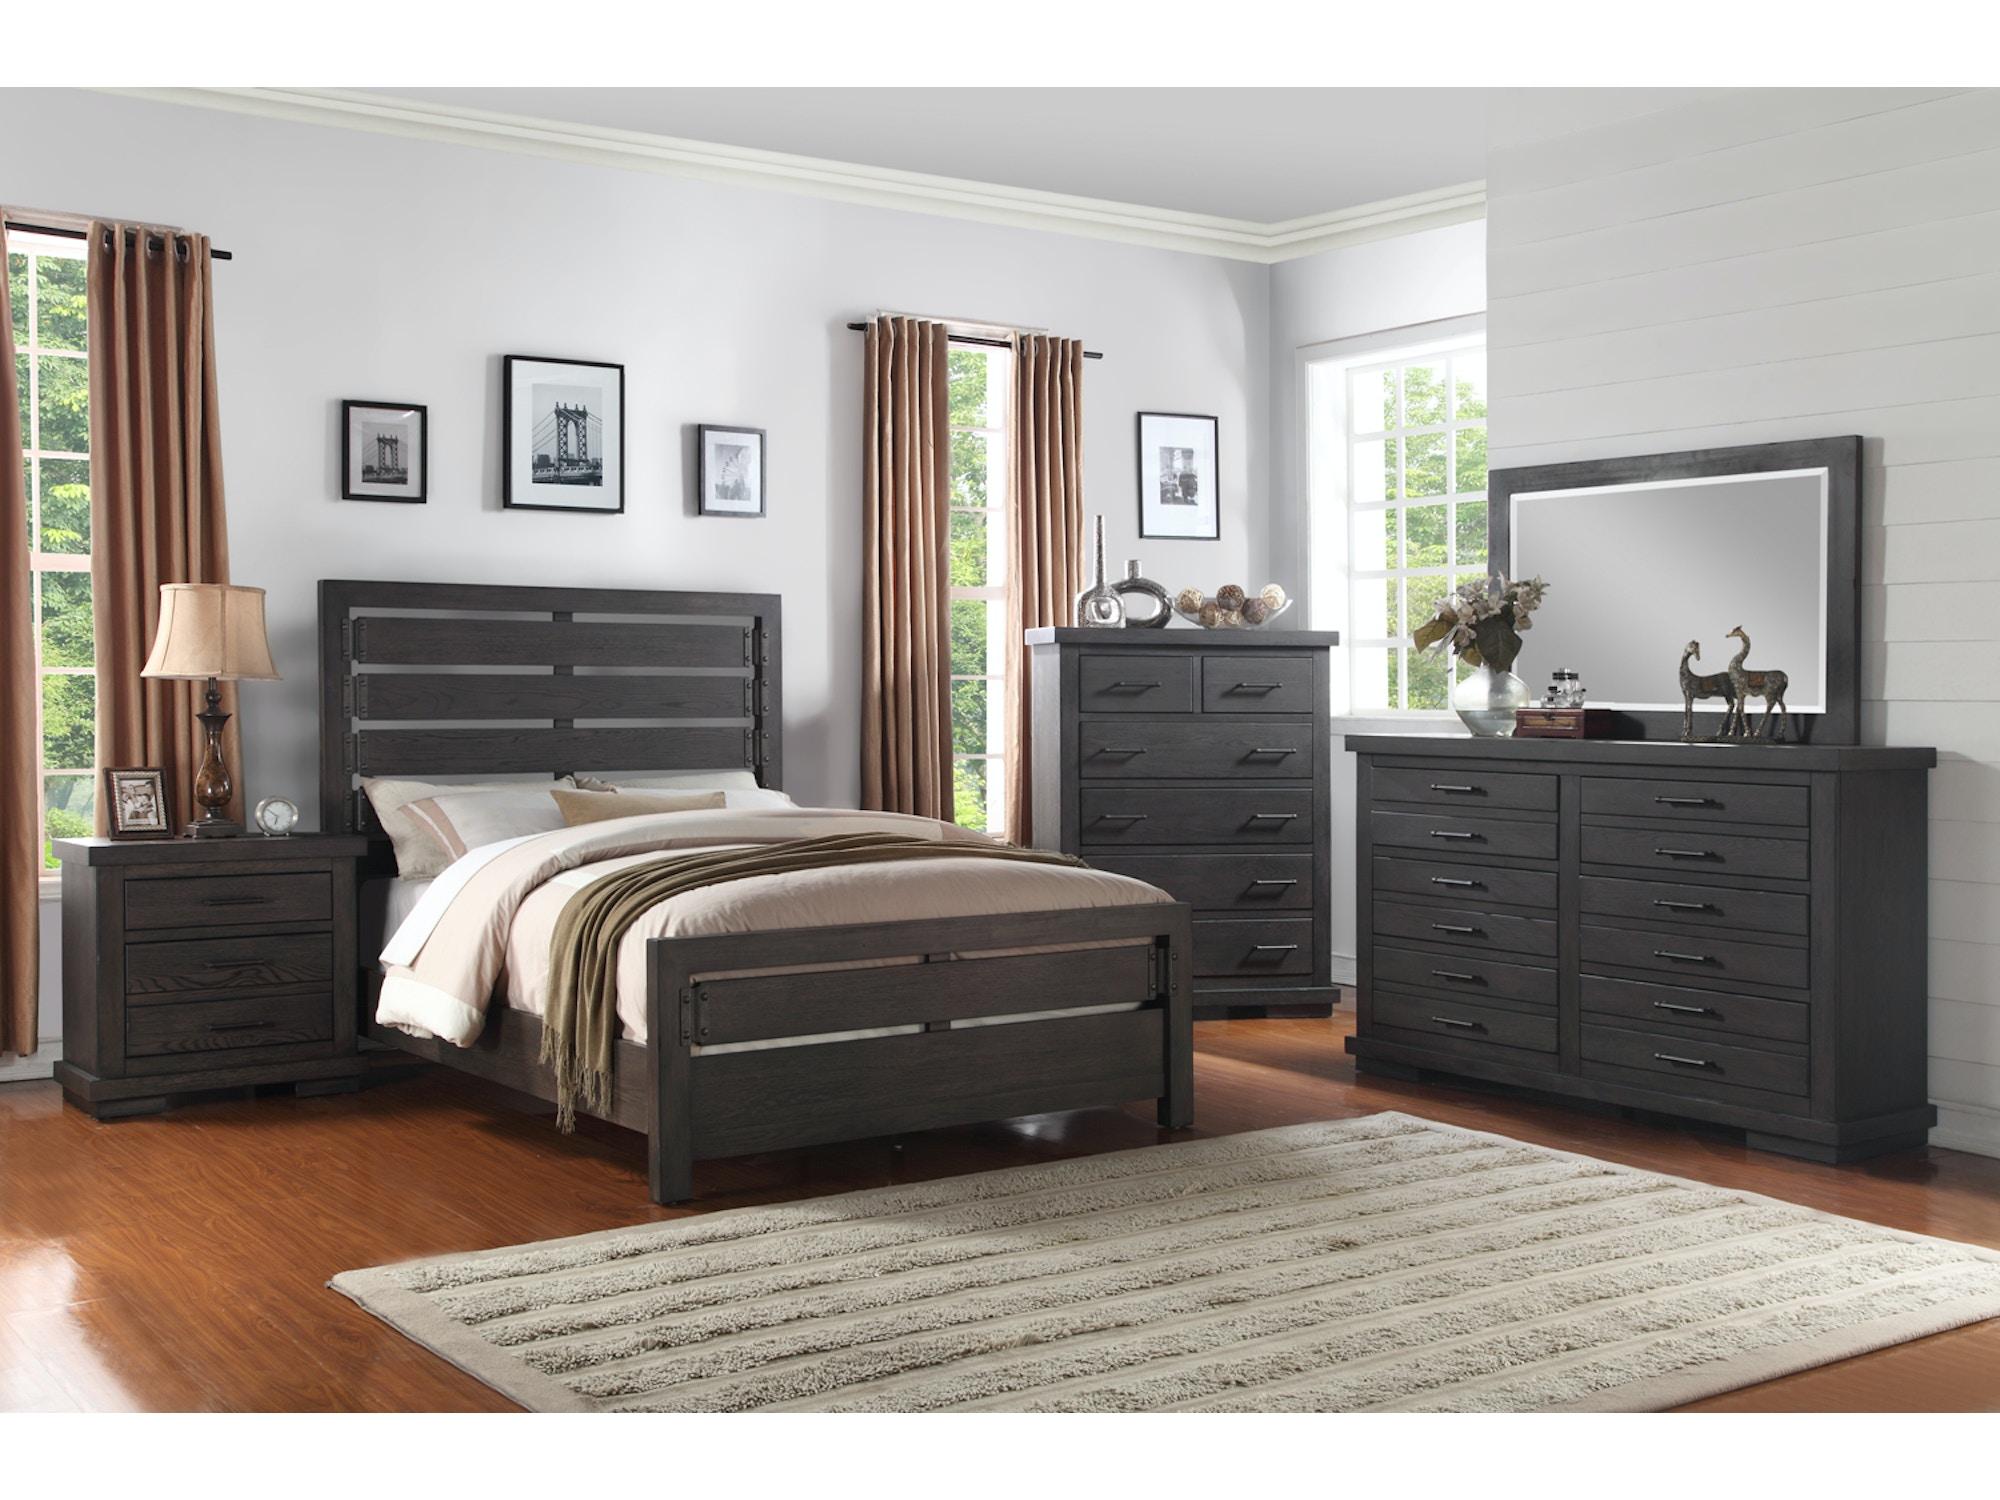 Holland House Master Bedroom Sets - Furniture Fair - Cincinnati ...